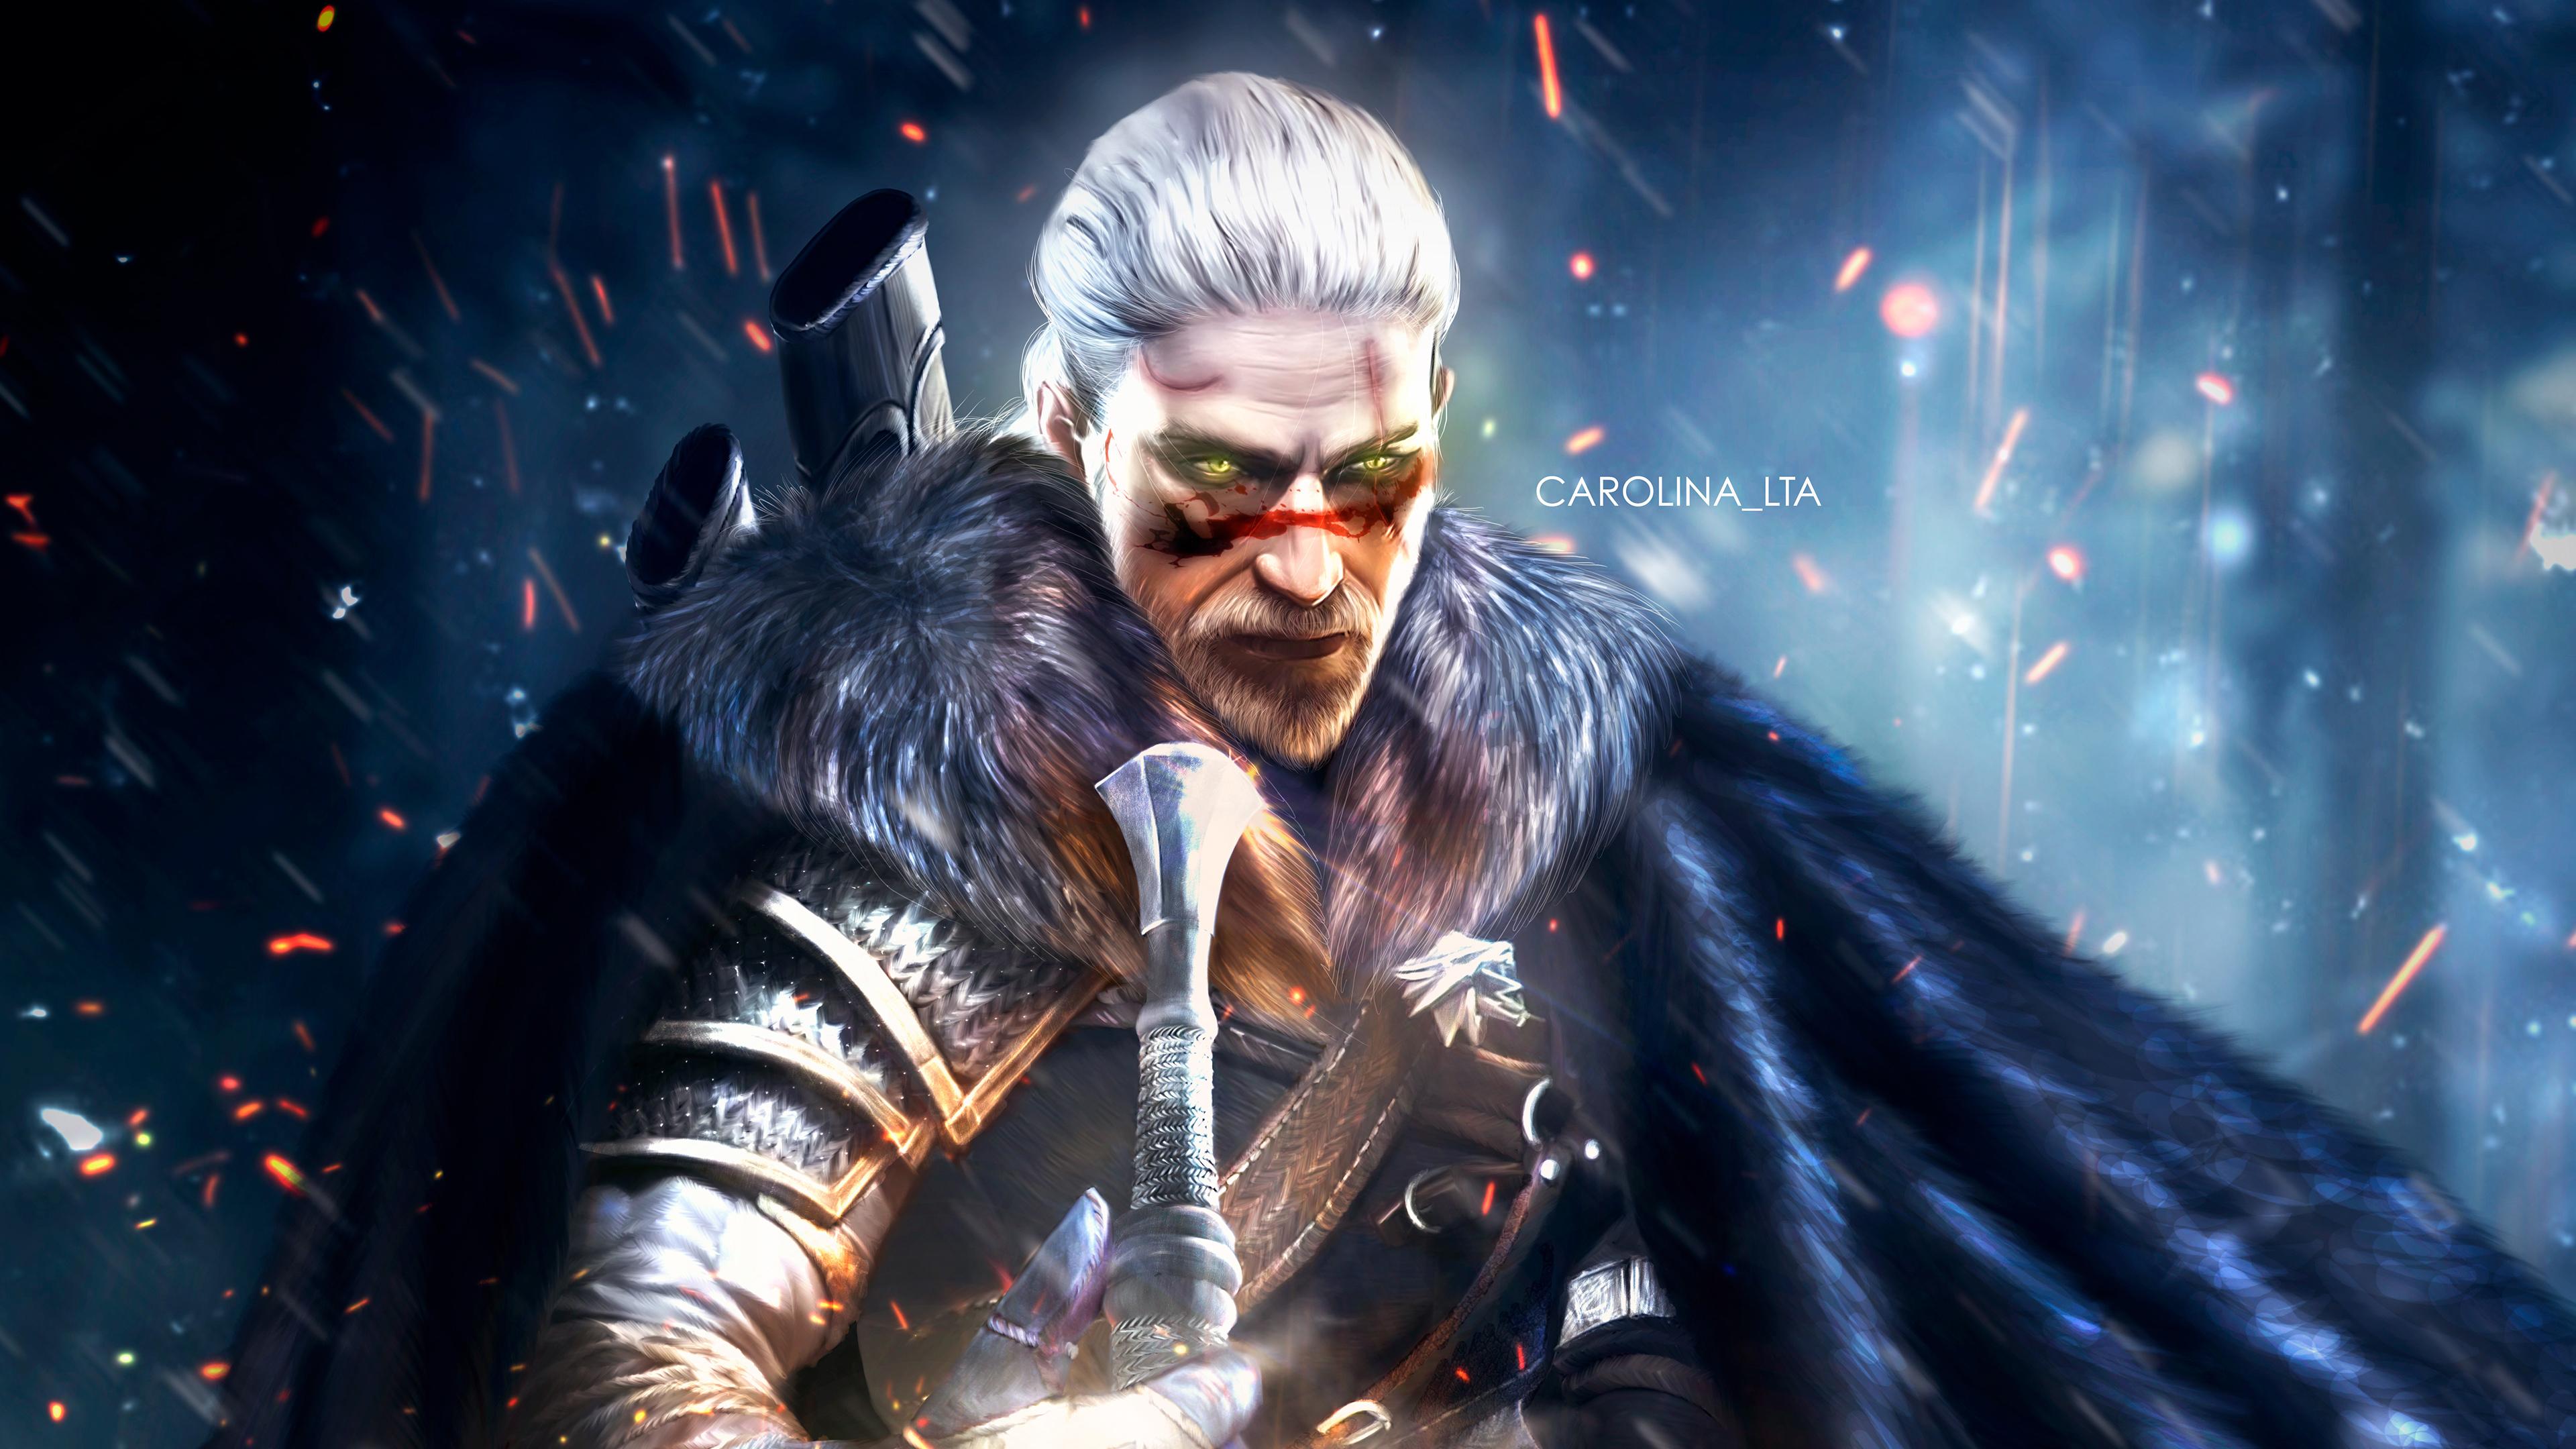 The Witcher 3 Wallpaper 4k: Geralt Of Rivia 4k, HD Games, 4k Wallpapers, Images